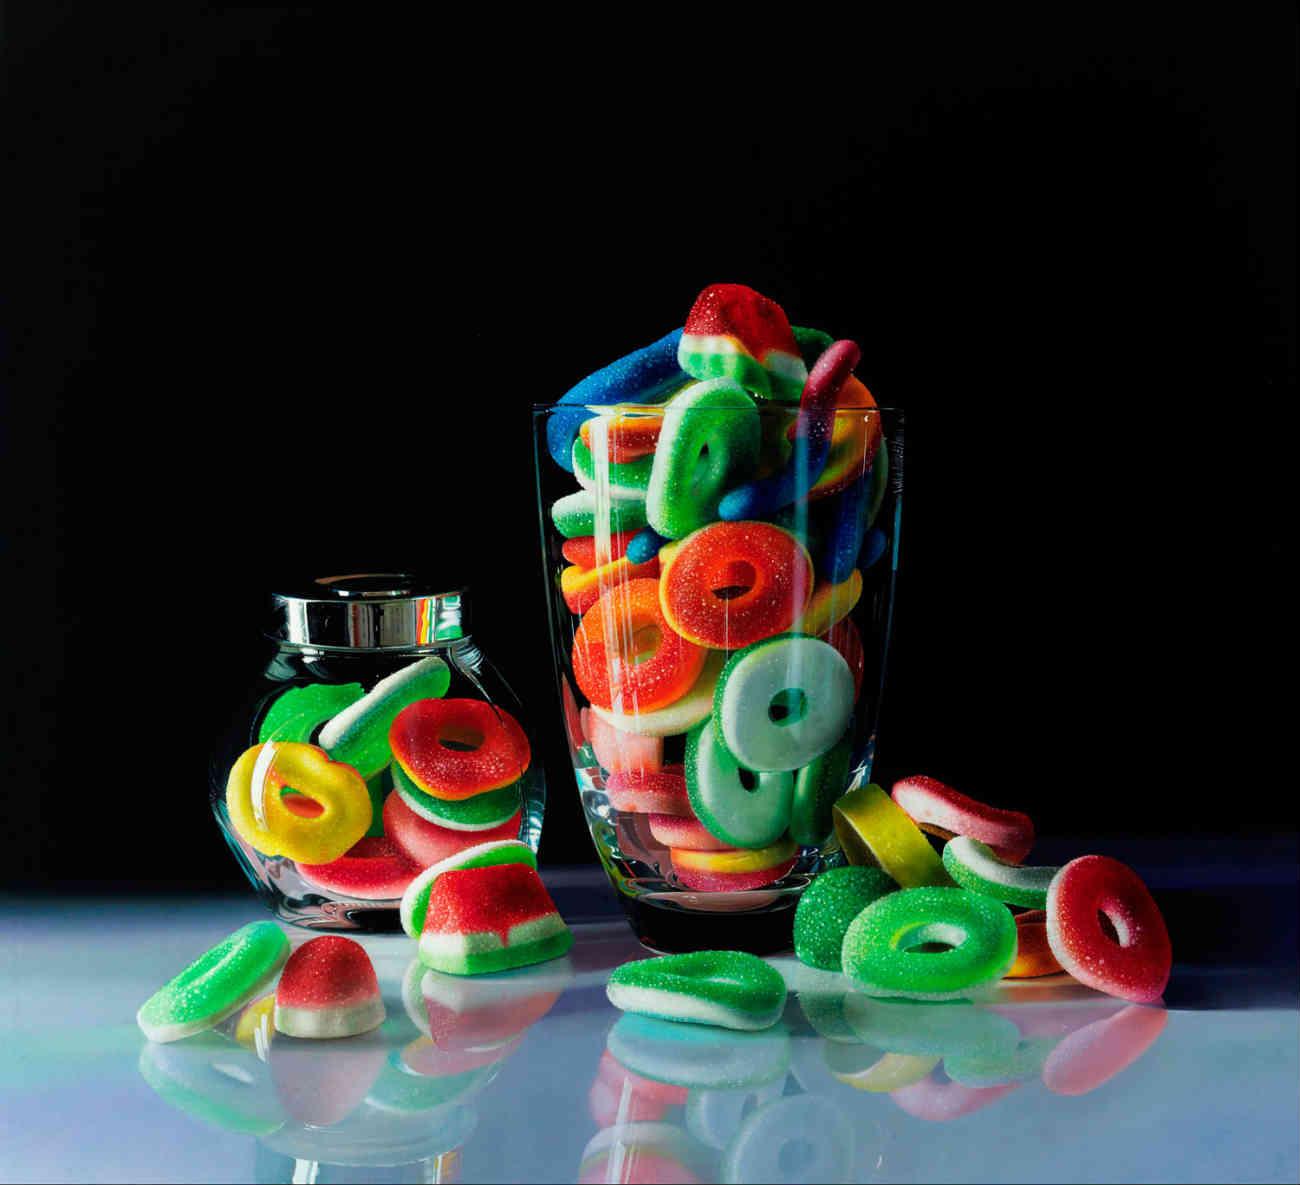 Roberto Bernardi photo realist candy